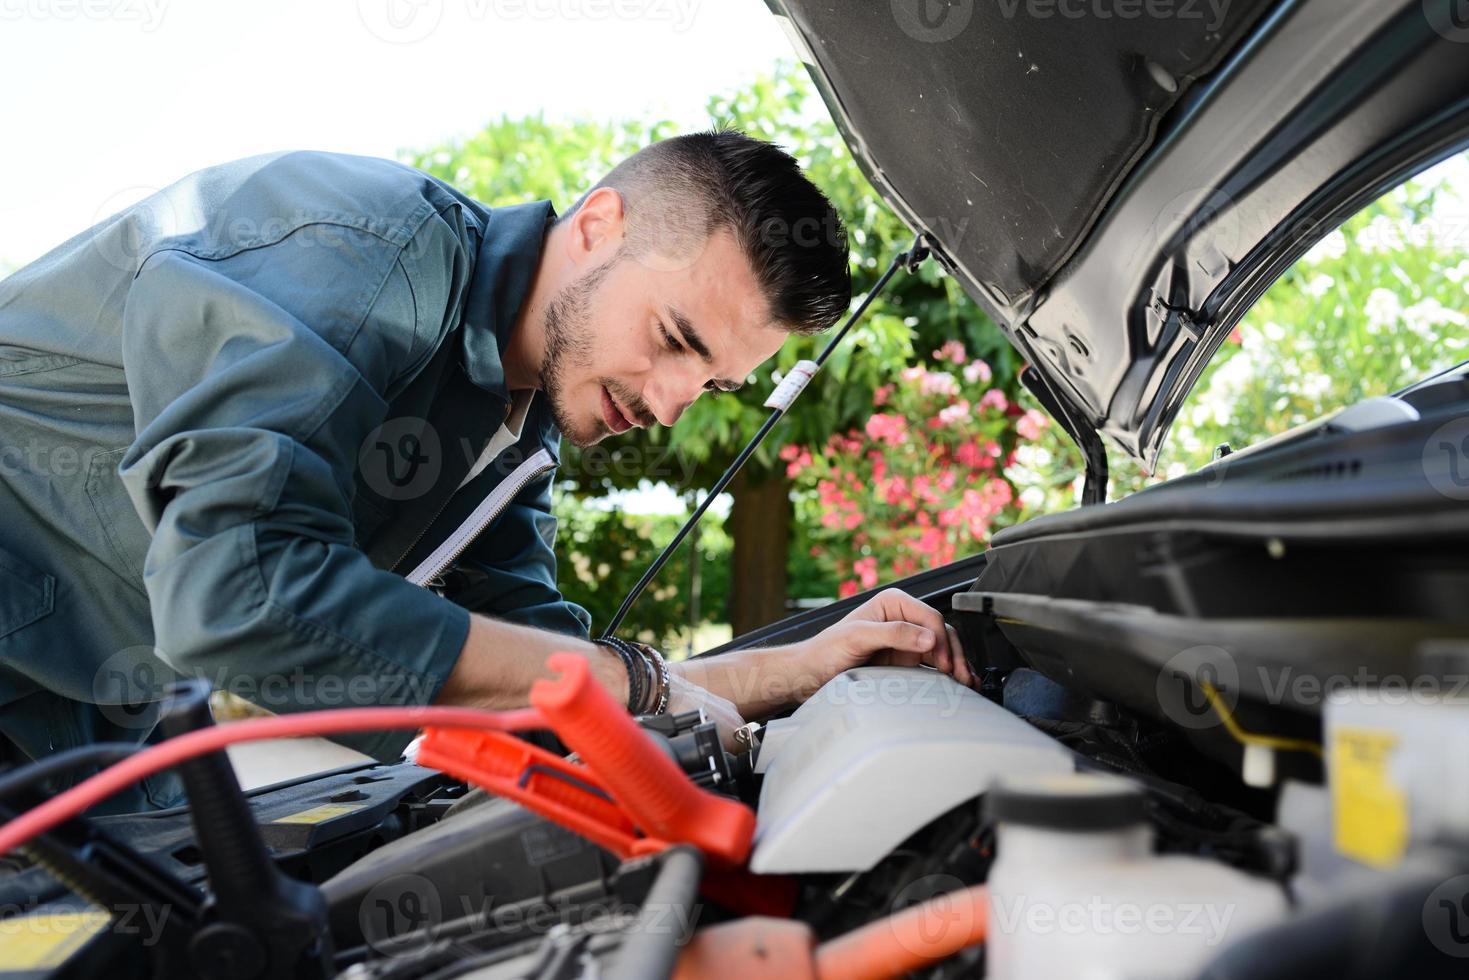 stilig ung man bilmekaniker kontrollera bilens motoruppdelning utomhus foto